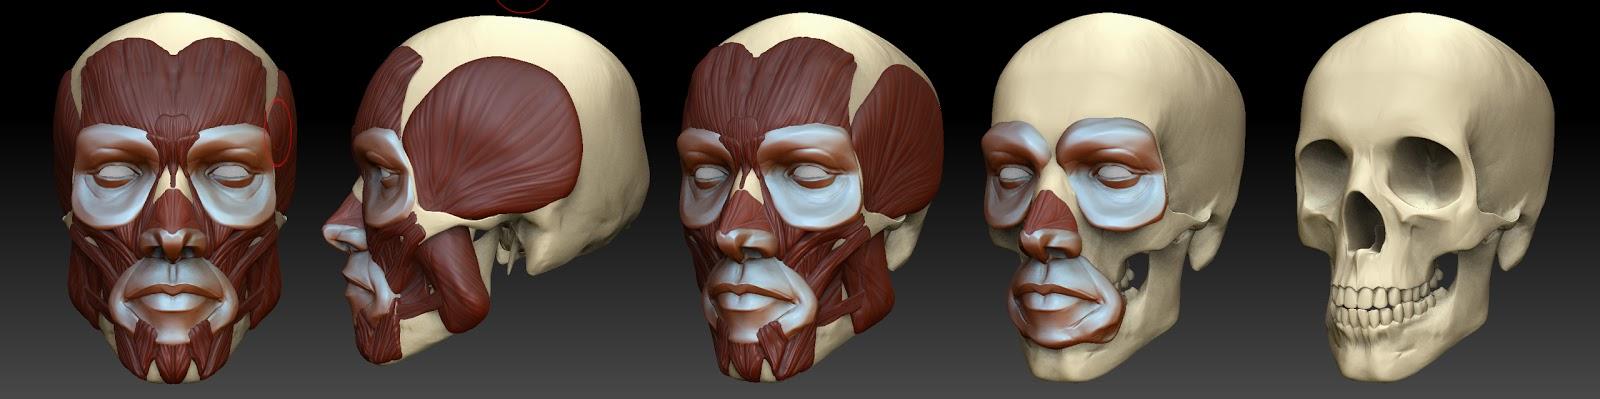 Anatomy Face Artists Zbrush